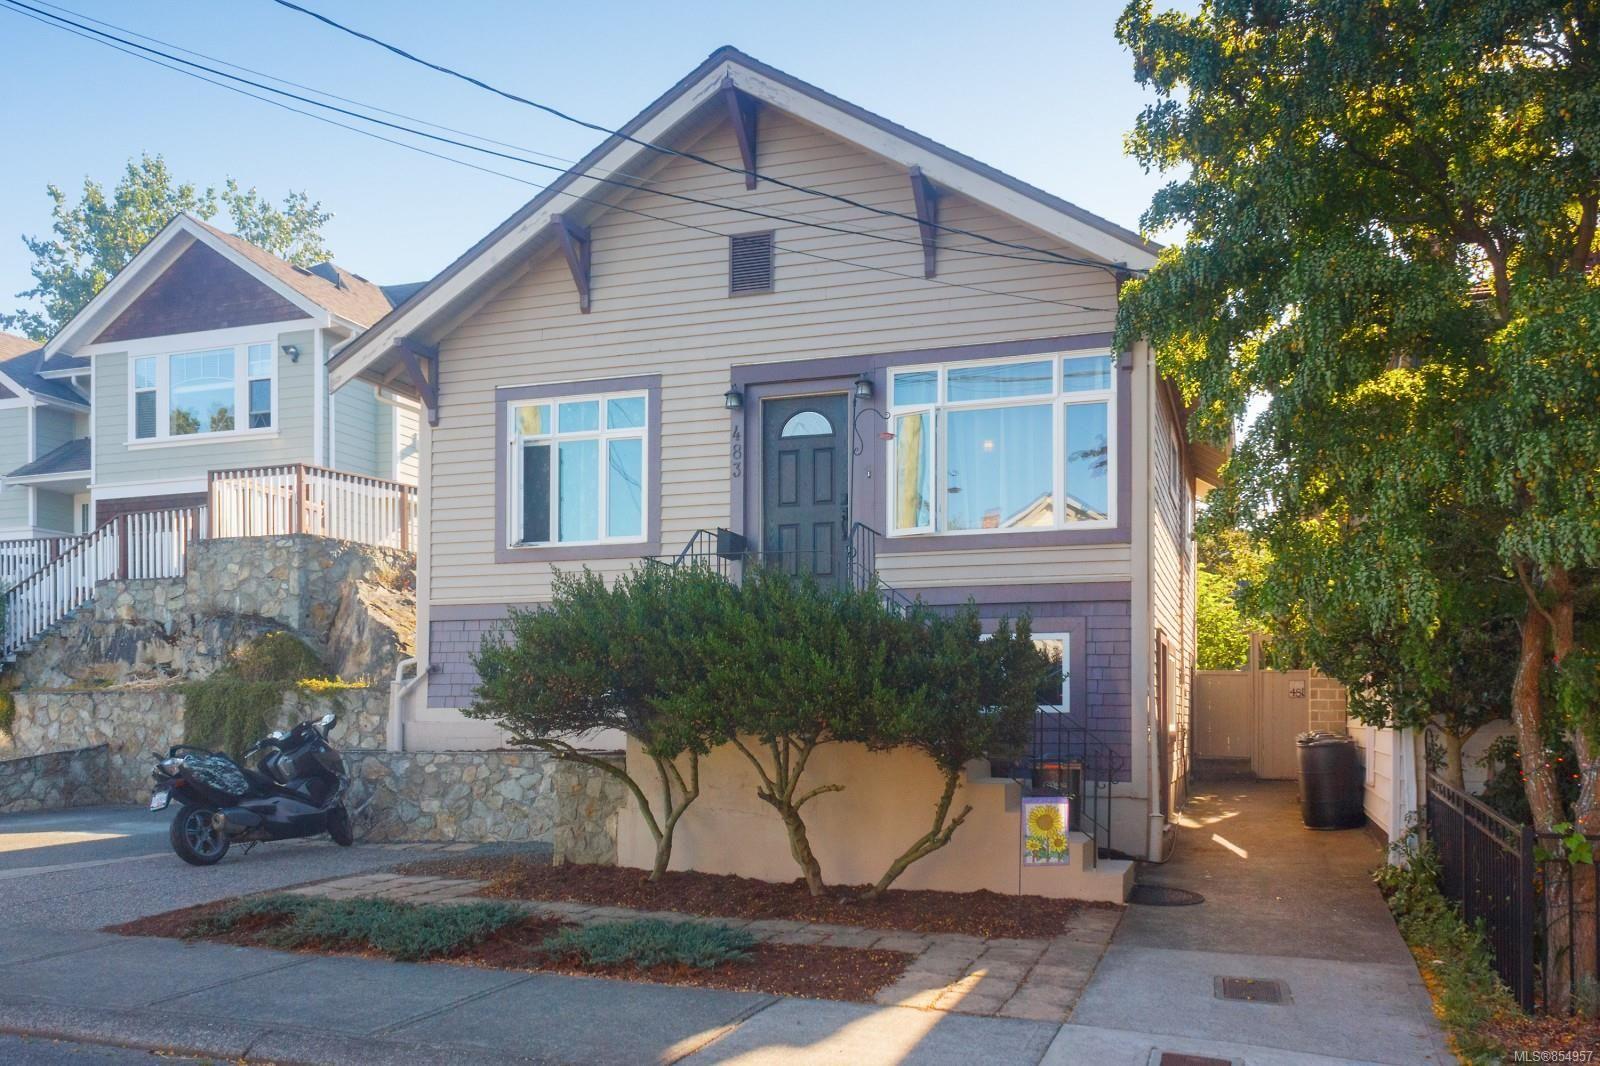 Main Photo: 483 Constance Ave in : Es Saxe Point House for sale (Esquimalt)  : MLS®# 854957